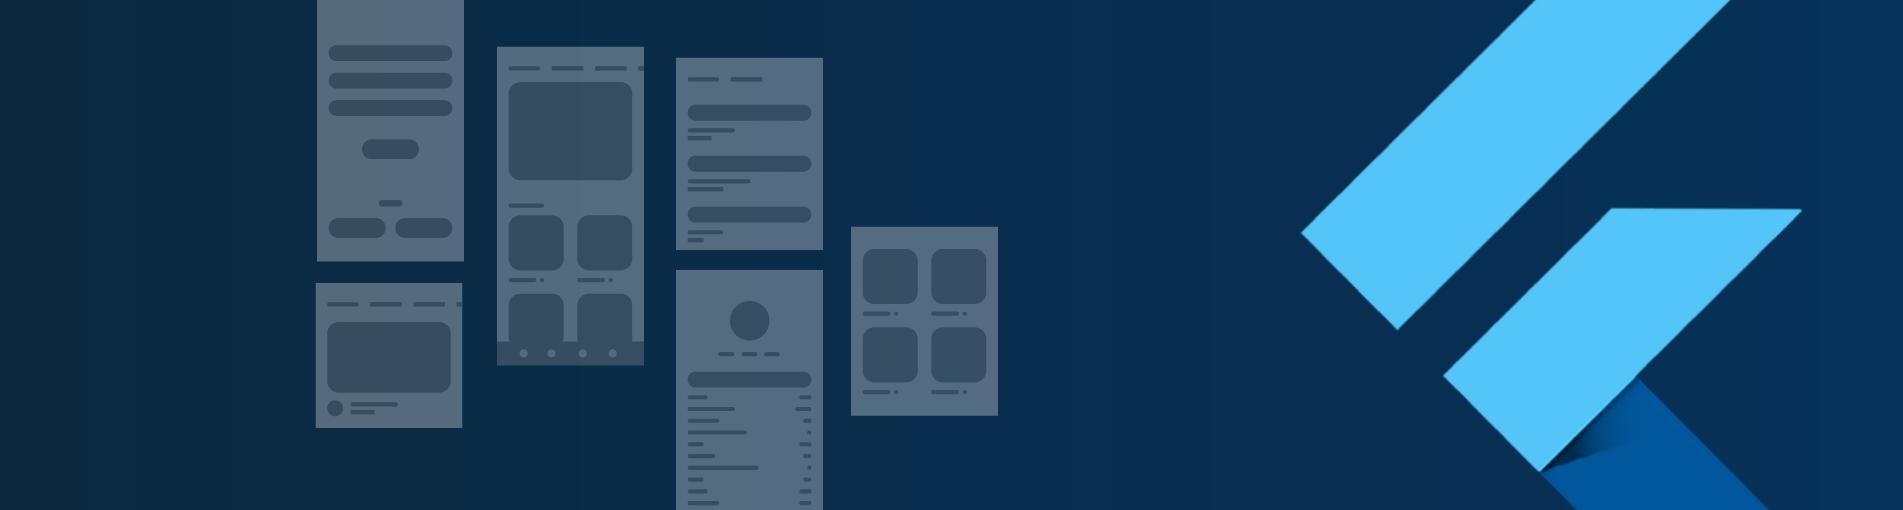 FLUTTER: cross-platform apps by Google